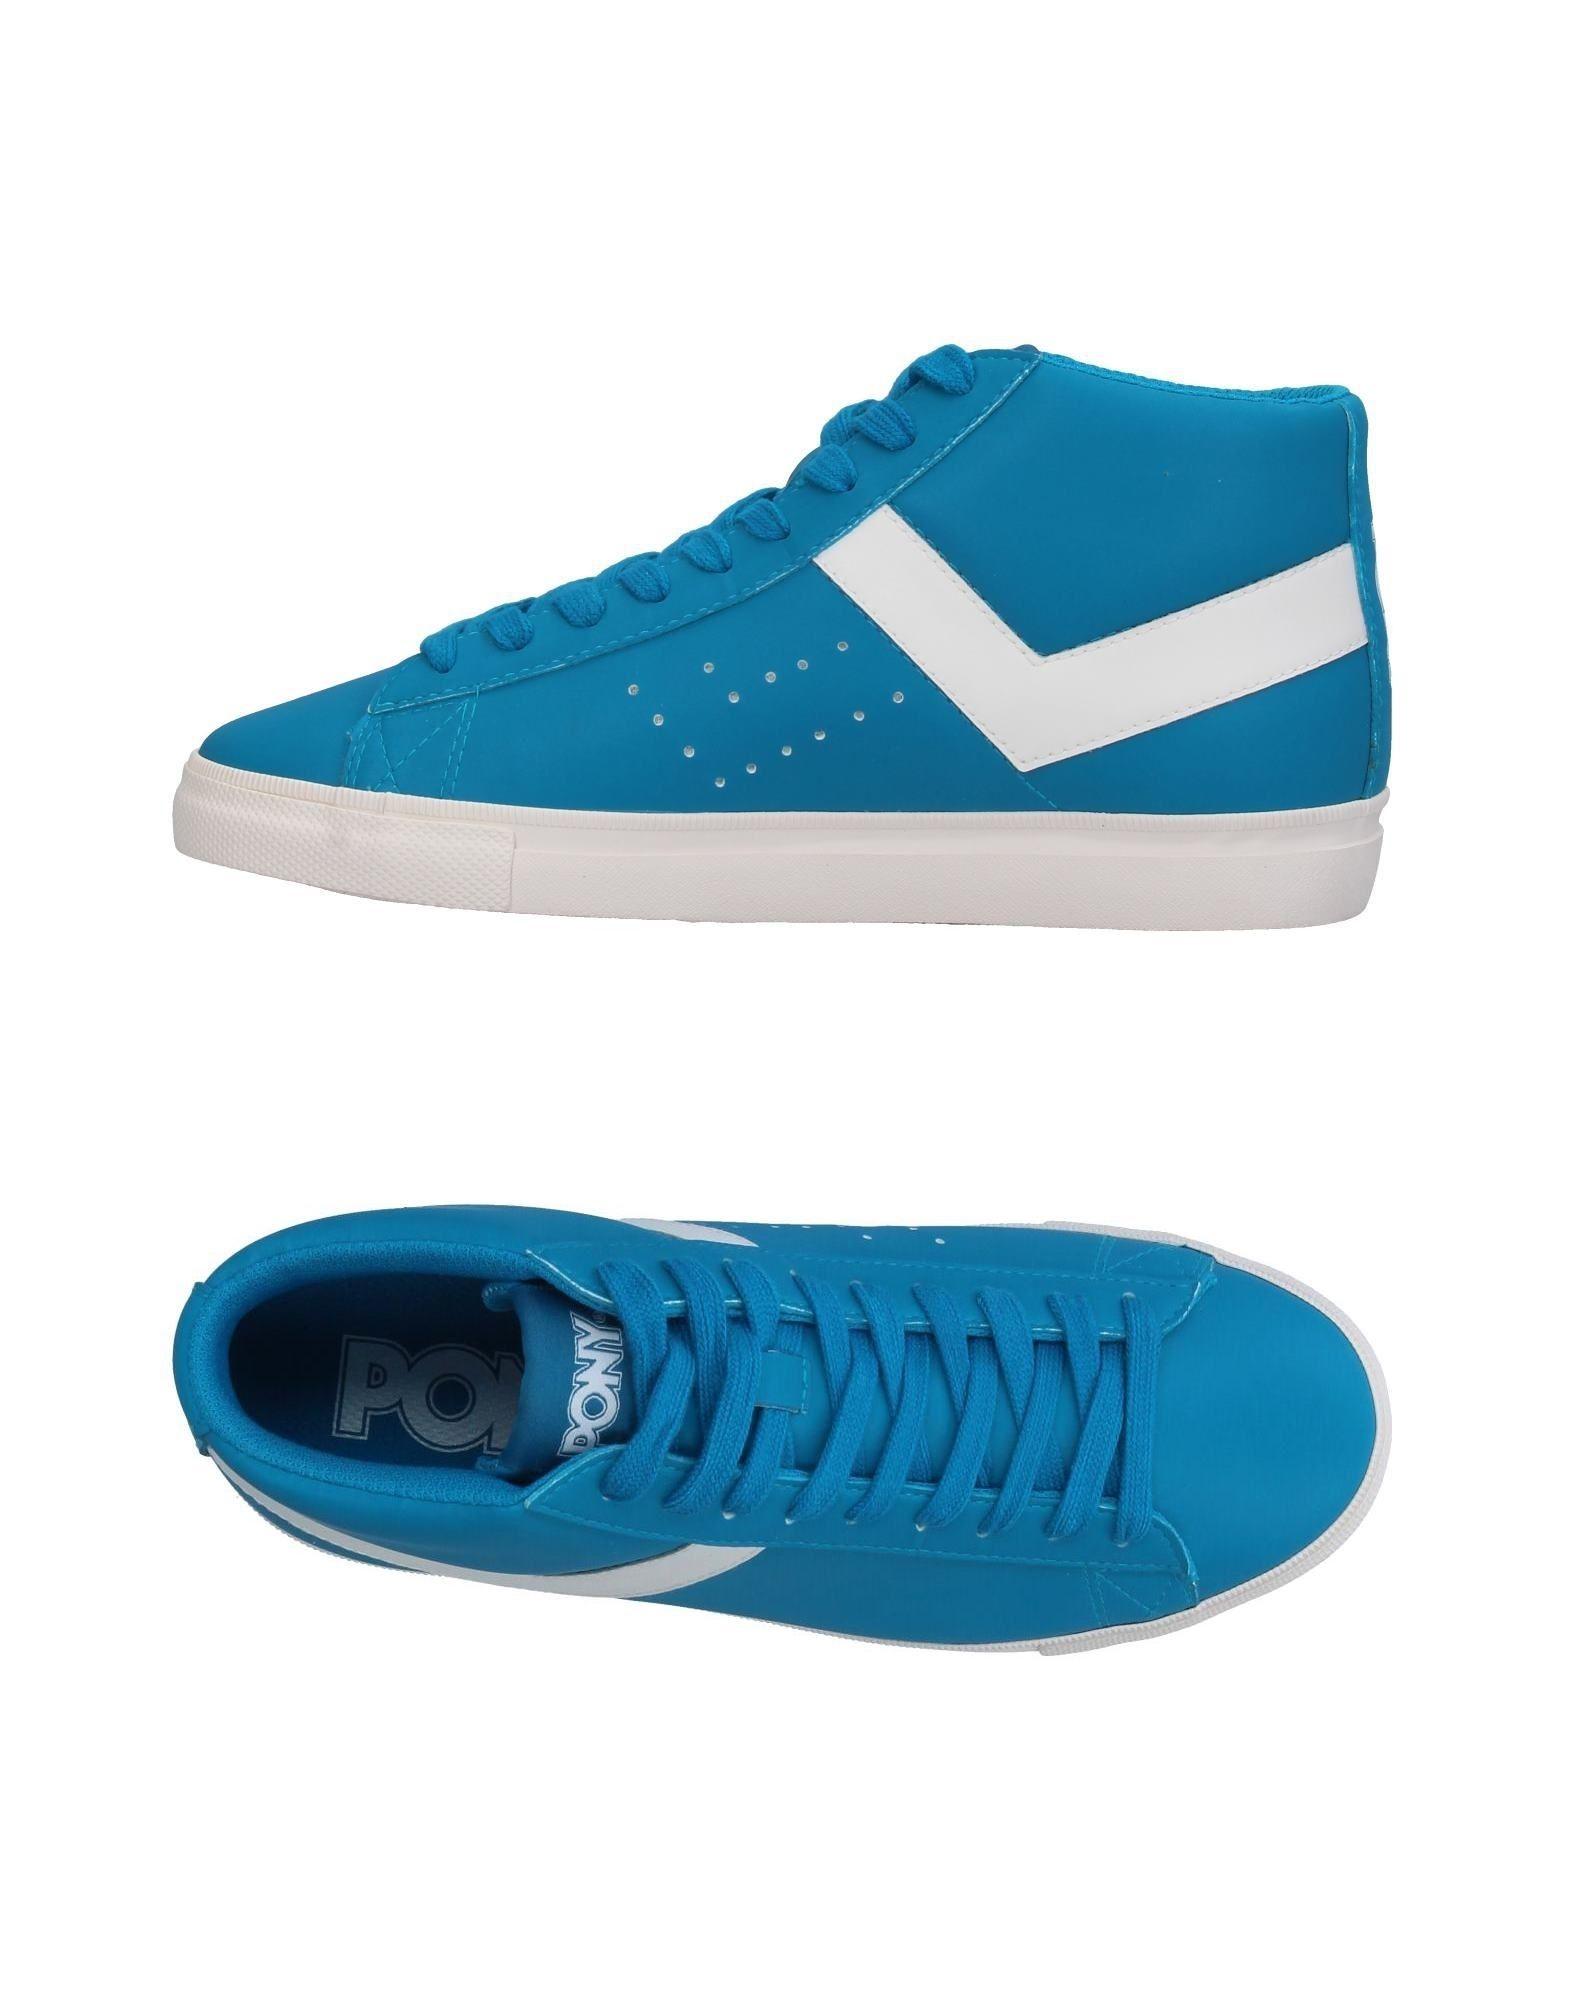 Pony Sneakers Damen  11353787HH Gute Qualität beliebte Schuhe